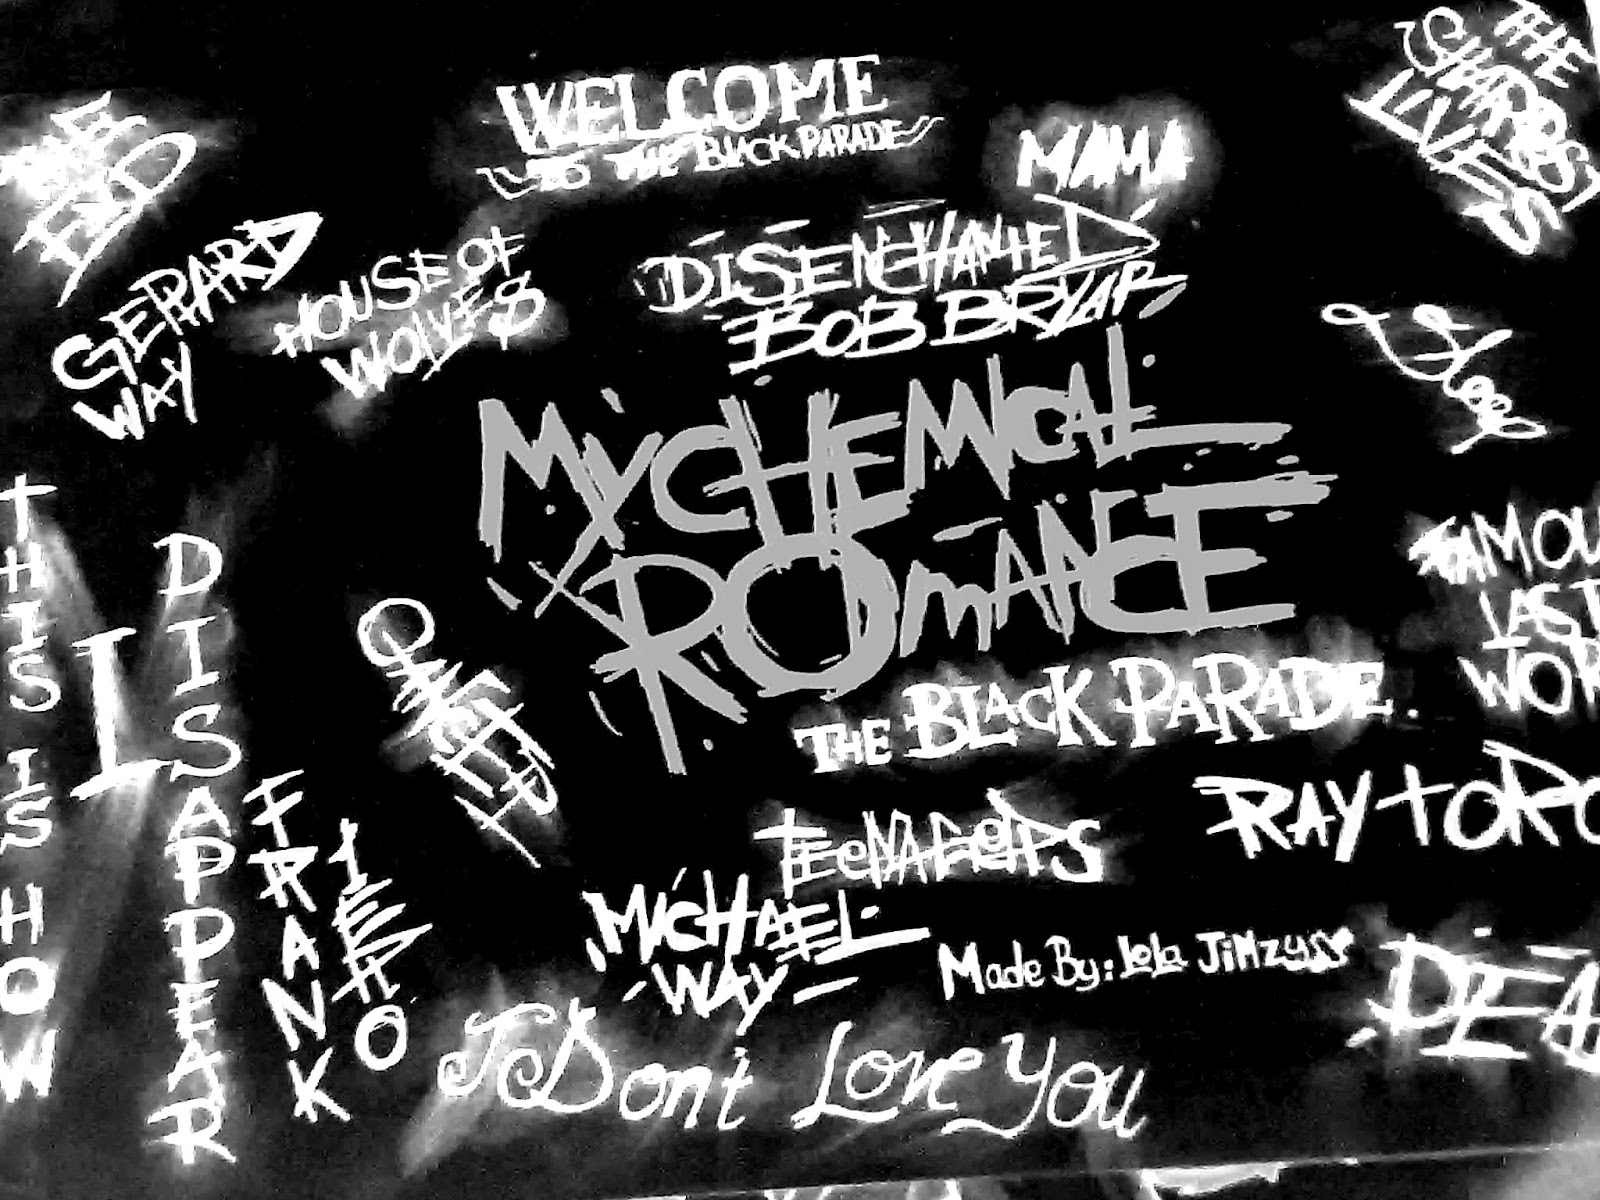 My Chemical Romance The Black Parade Wallpaper My chemical romance 1600x1200